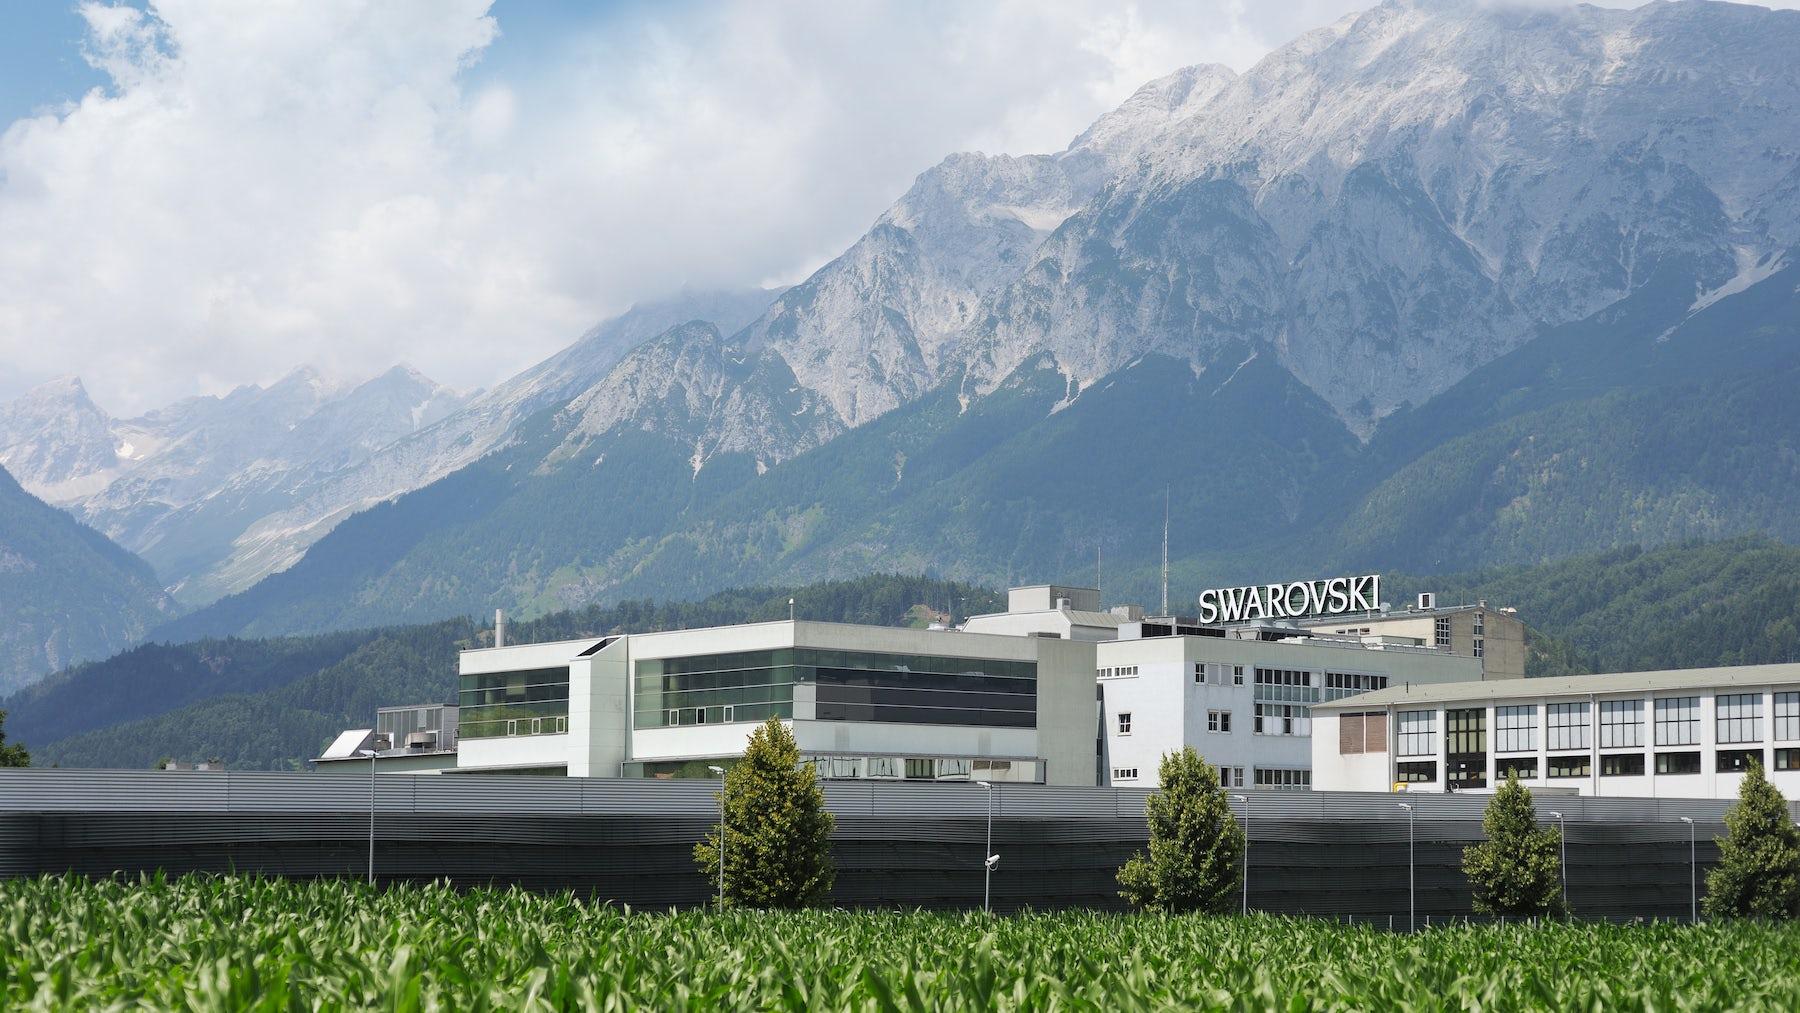 Swarovski factory in Wattens, Austria | Source: Courtesy